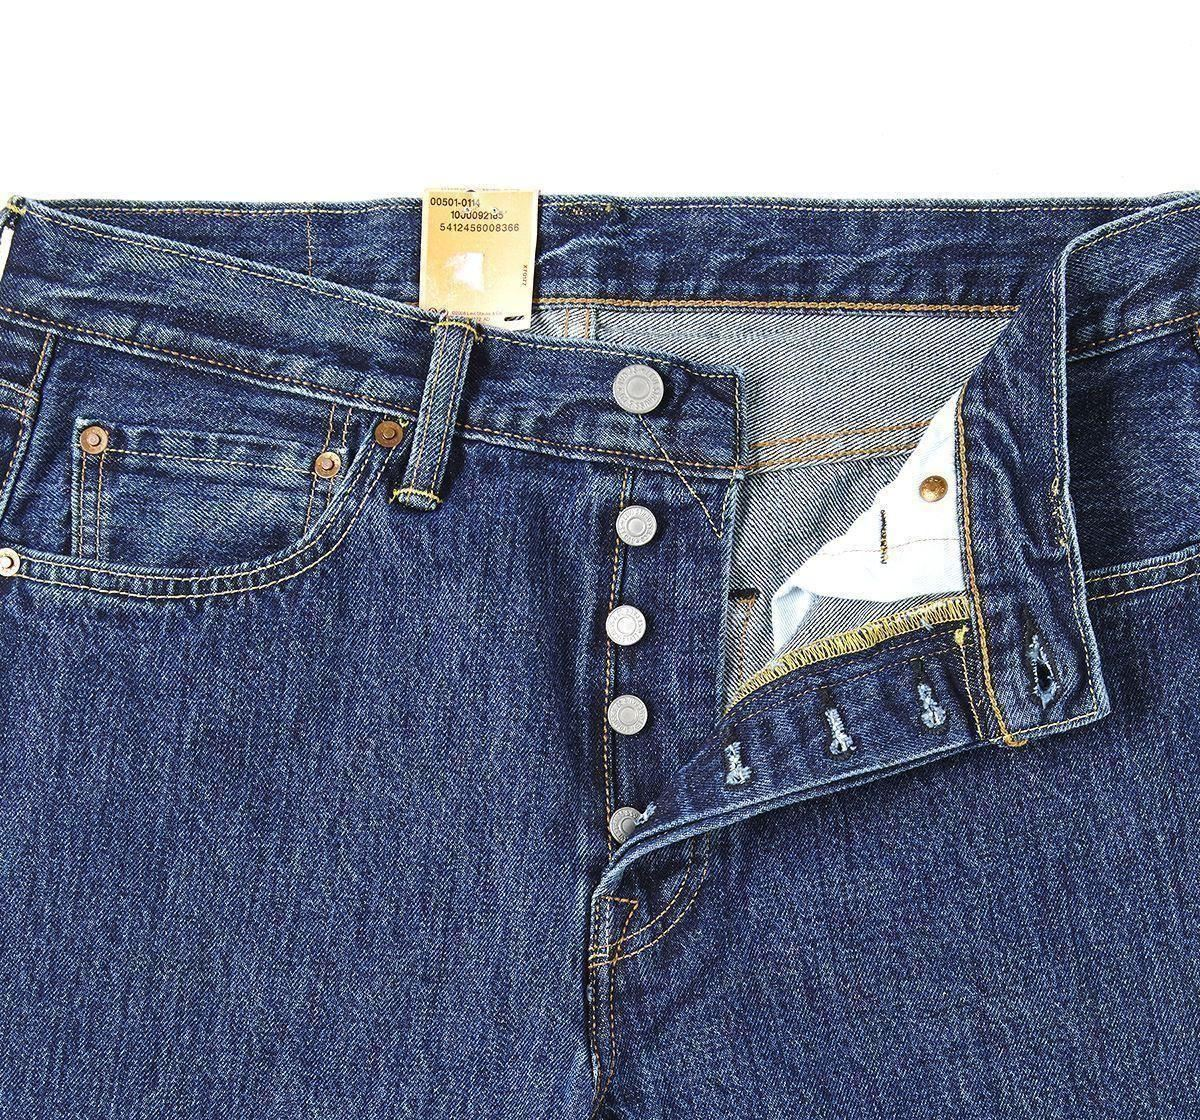 Levis 501 original fit classic straight leg button fly jeans | eBay